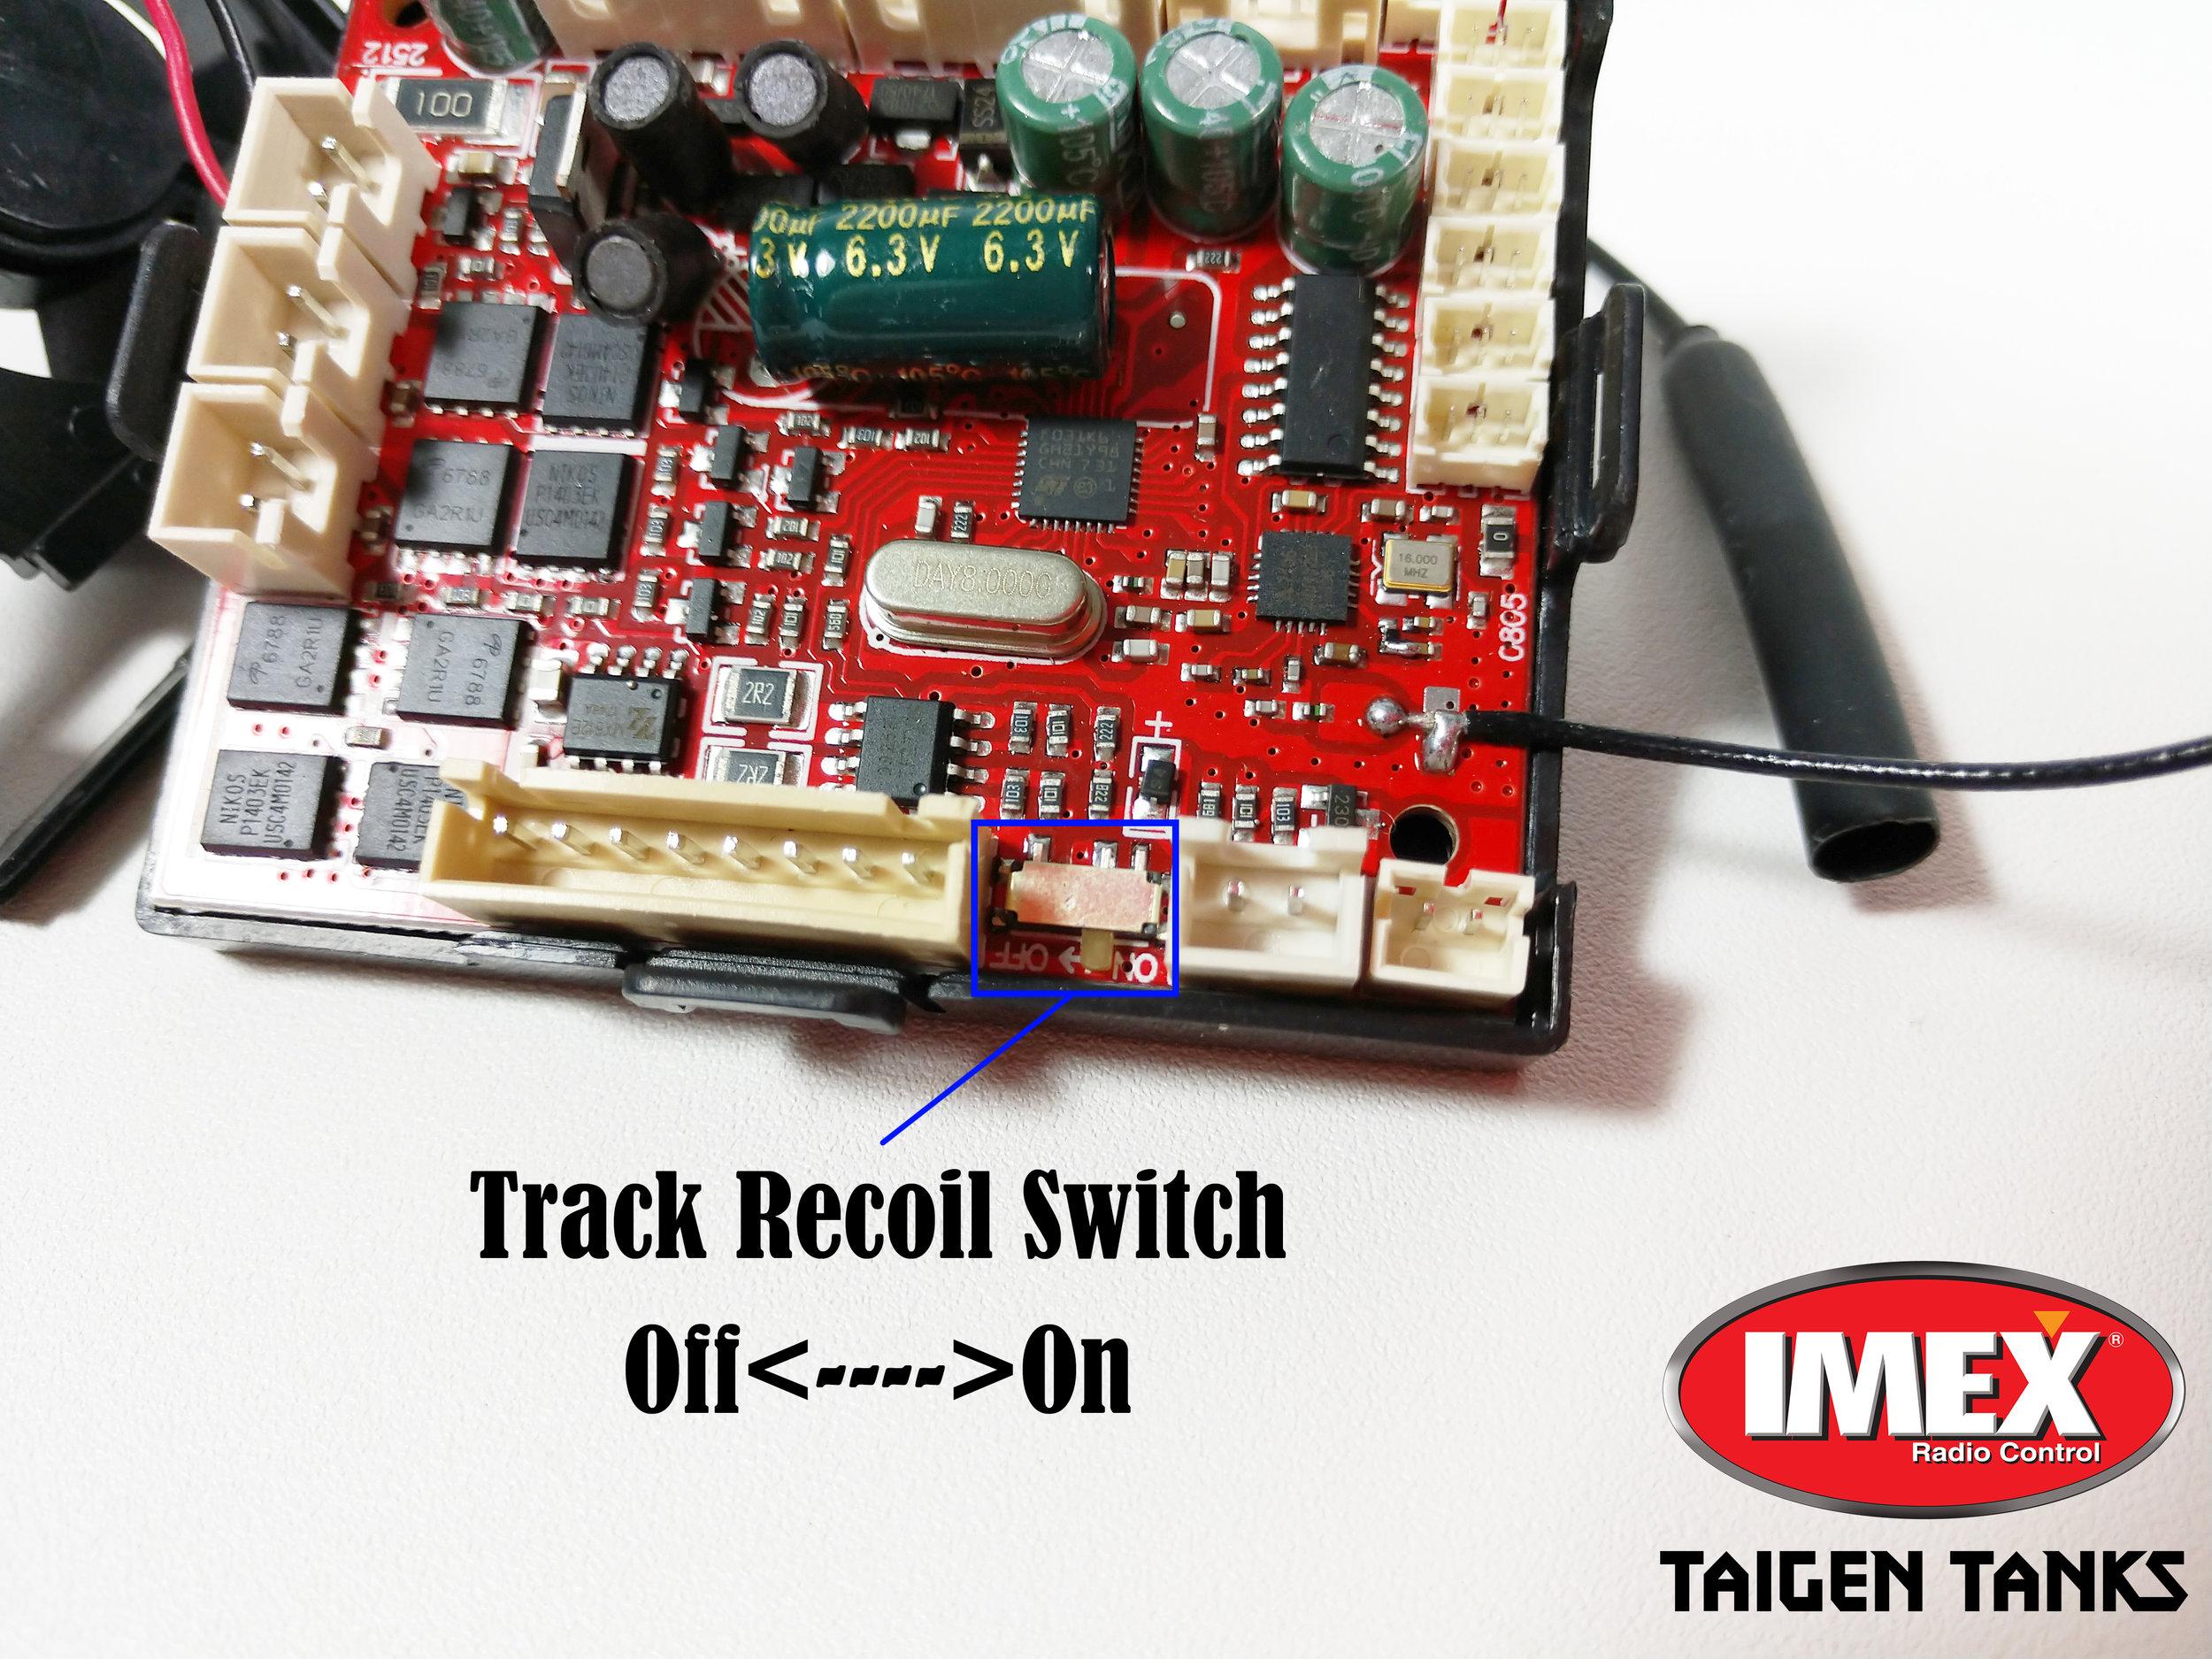 Taigen V3 2 4GHz Motherboard & Sound Card (Choose Sounds) — Taigen Tanks